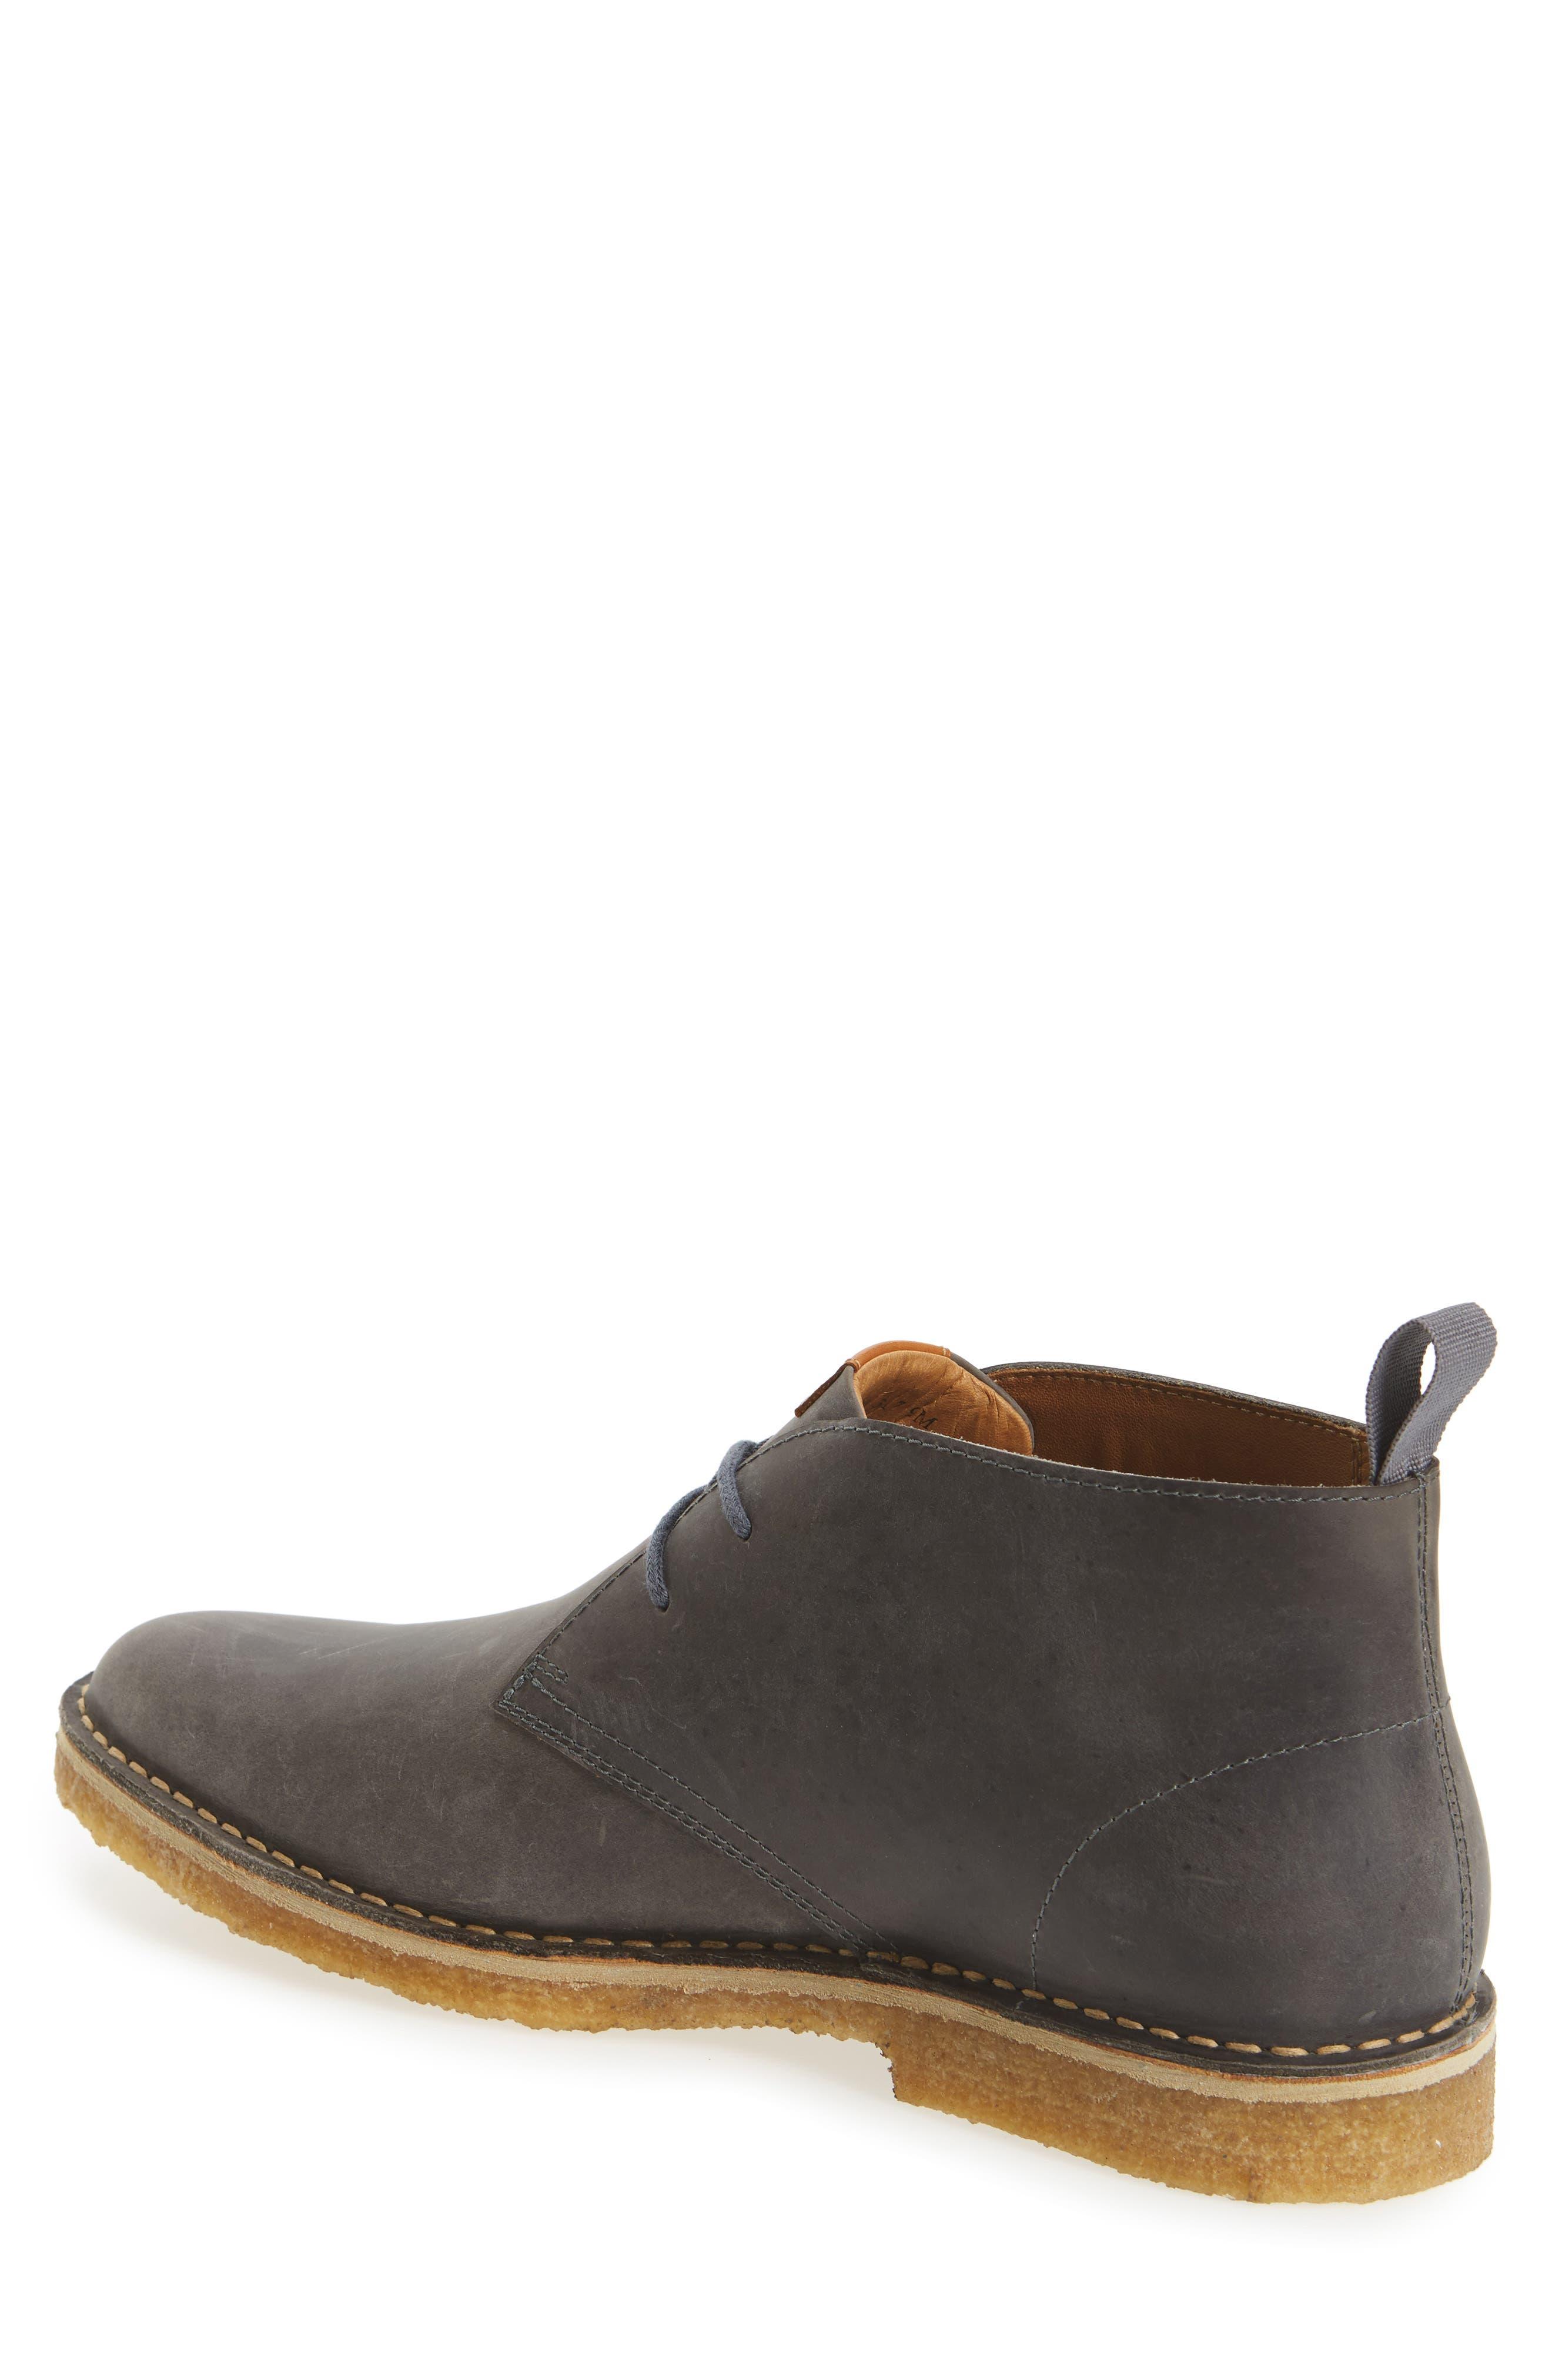 Alternate Image 2  - 1901 Westport Chukka Boot (Men)